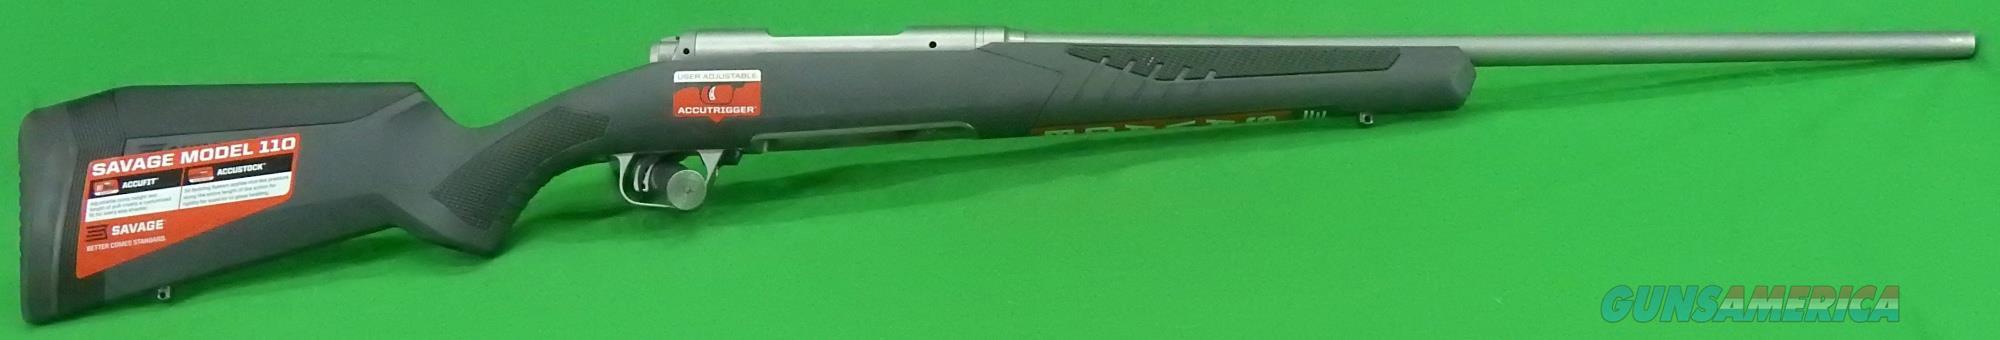 110 Storm Gray Syn LH 300Win 24In  57059  Guns > Rifles > Savage Rifles > 10/110